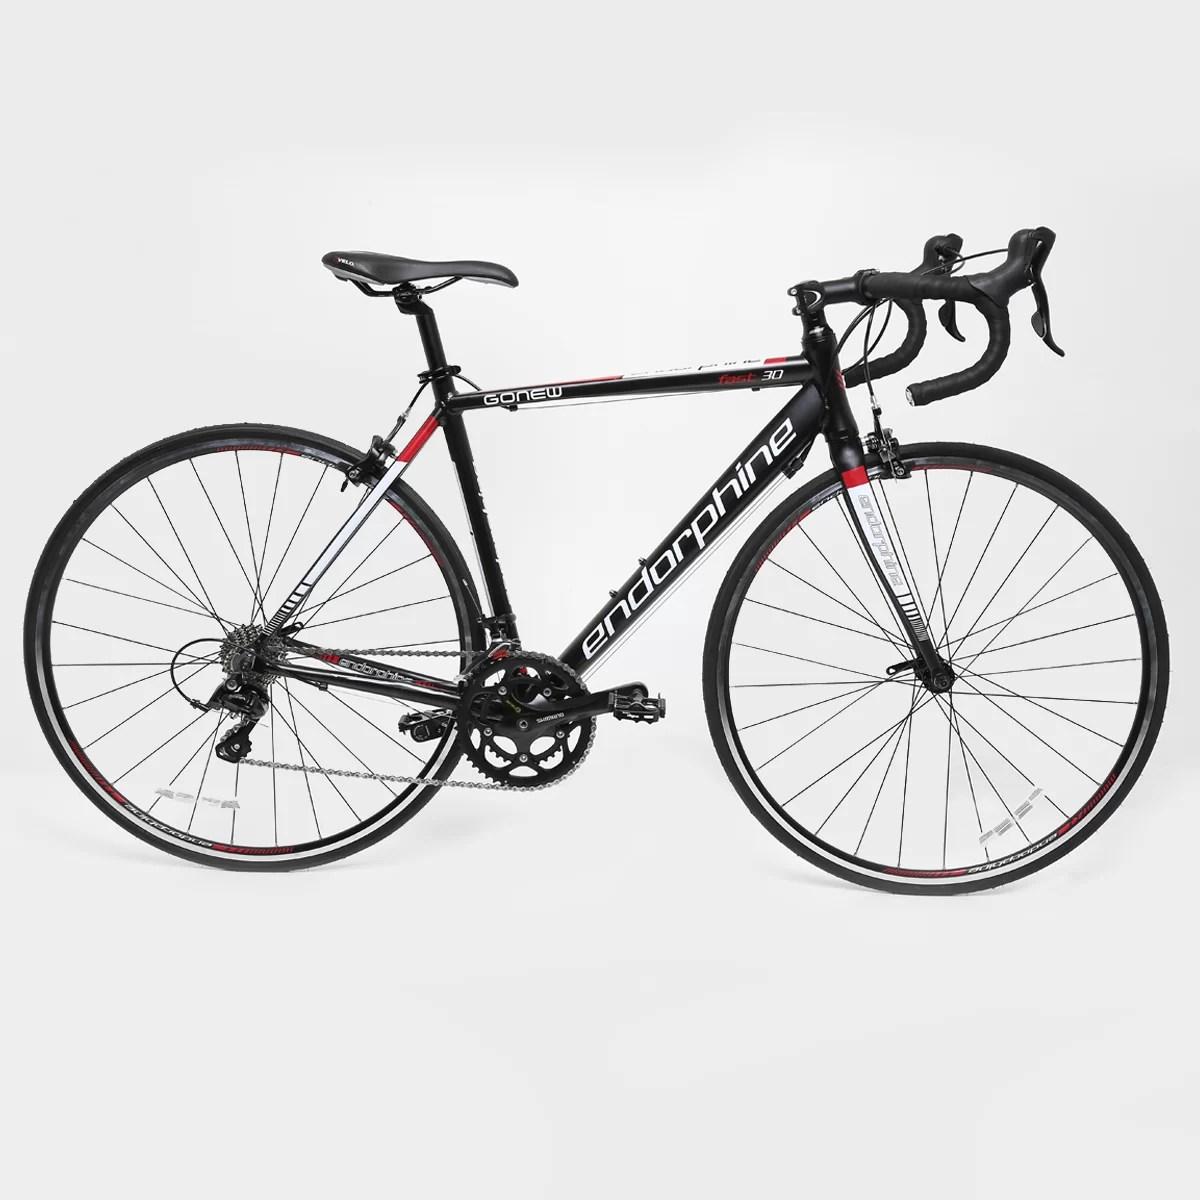 Bicicleta Speed Endorphine Gonew Fast 30 Shimano Aluminio